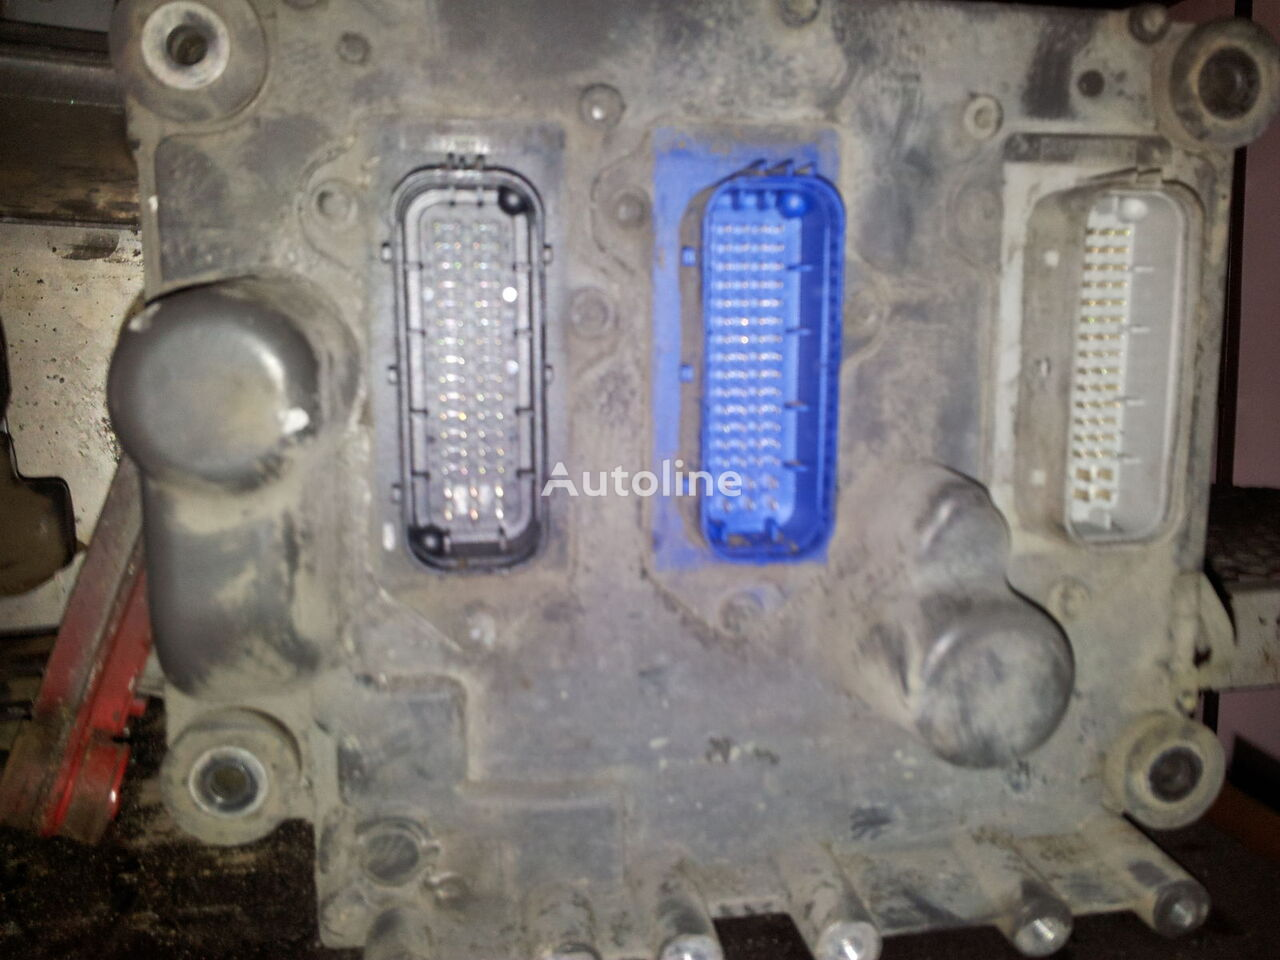 centralina  DAF 105XF EURO5 electronic control unit ECU EDC engine managment, engine control unit, DMCI 1679021; 1684367, 1664539, 1679021, 1684367, 1887331 per trattore stradale DAF 105XF